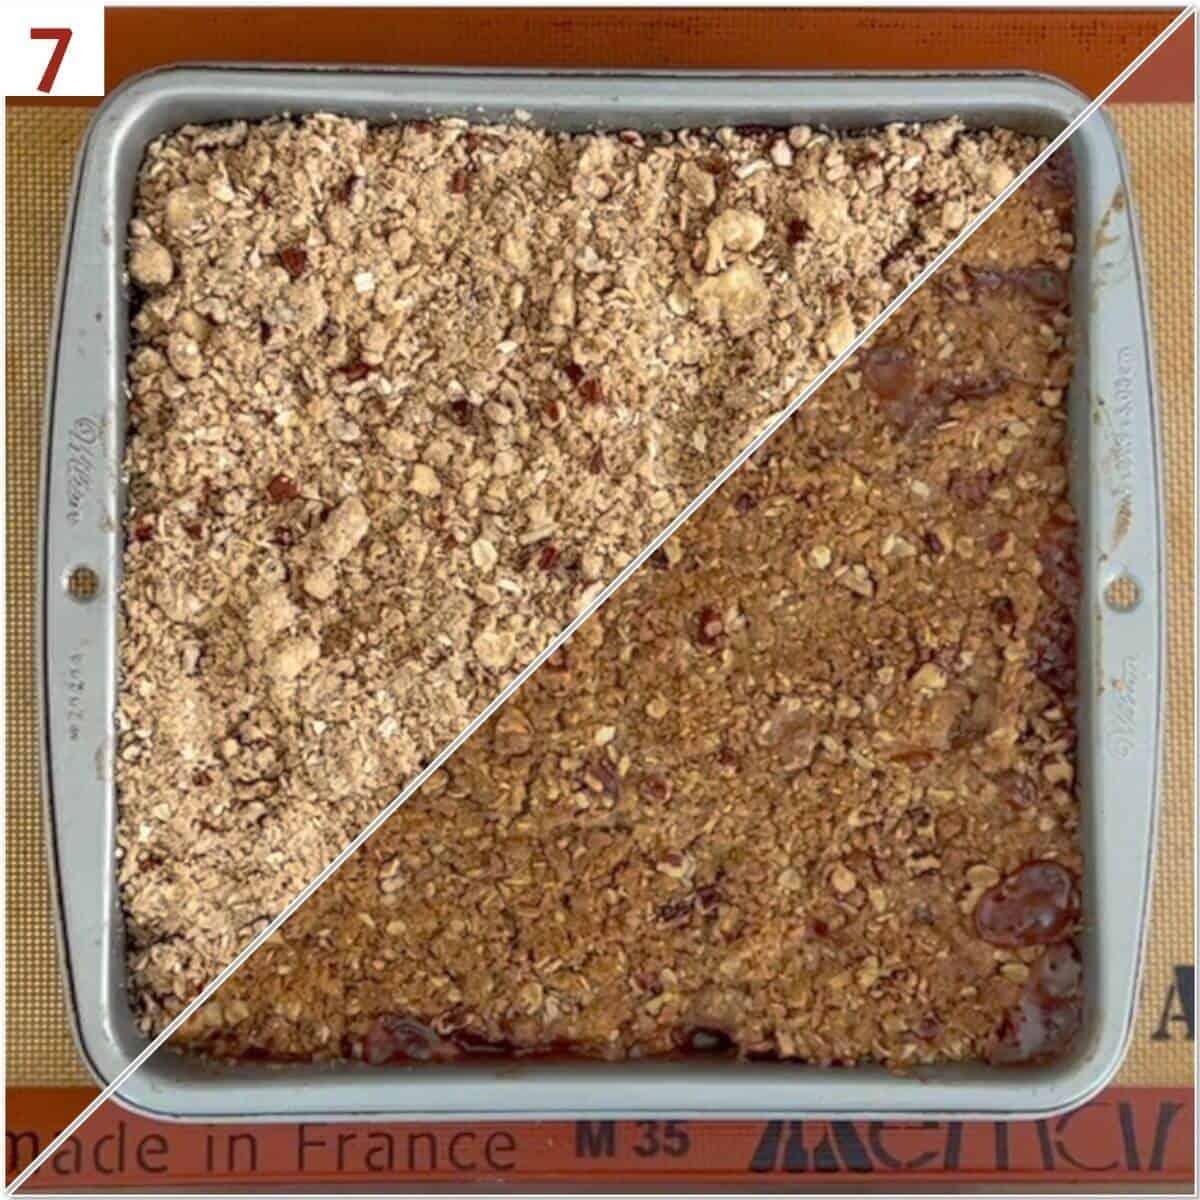 Collage of Apple Crisp before & after baking.